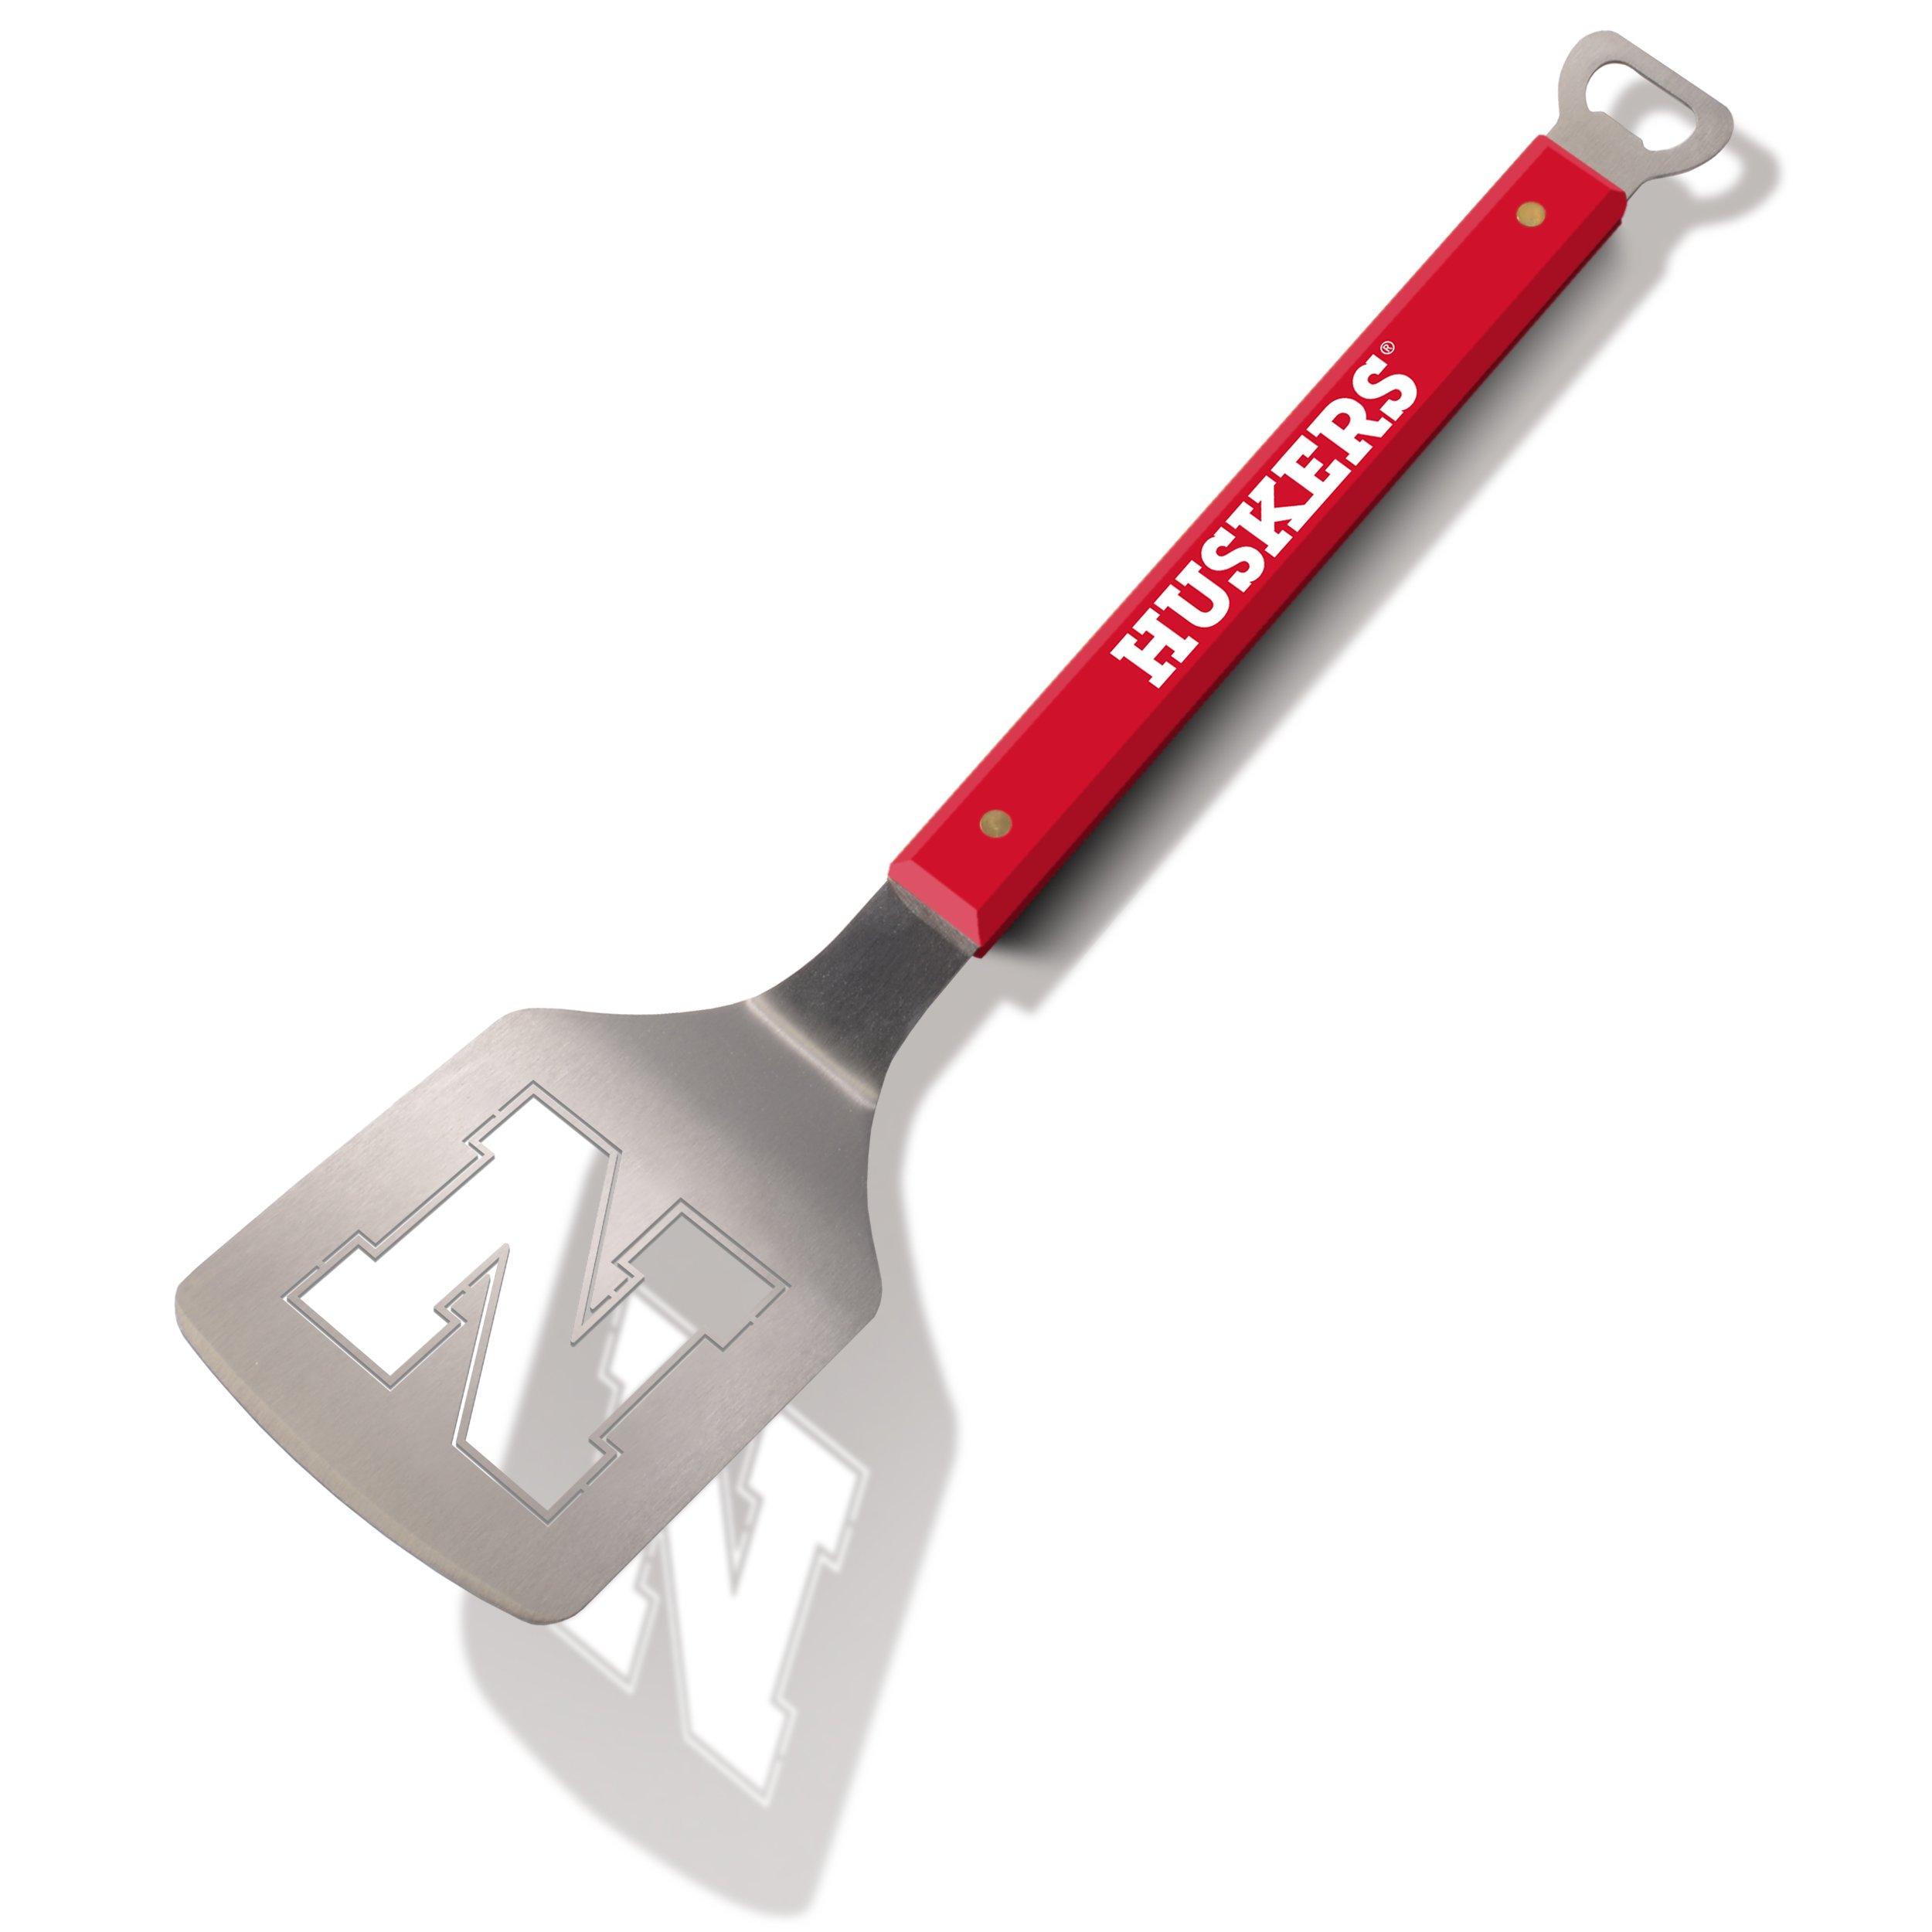 NCAA Nebraska Cornhuskers Spirit Series Sportula Stainless Steel Grilling Spatula